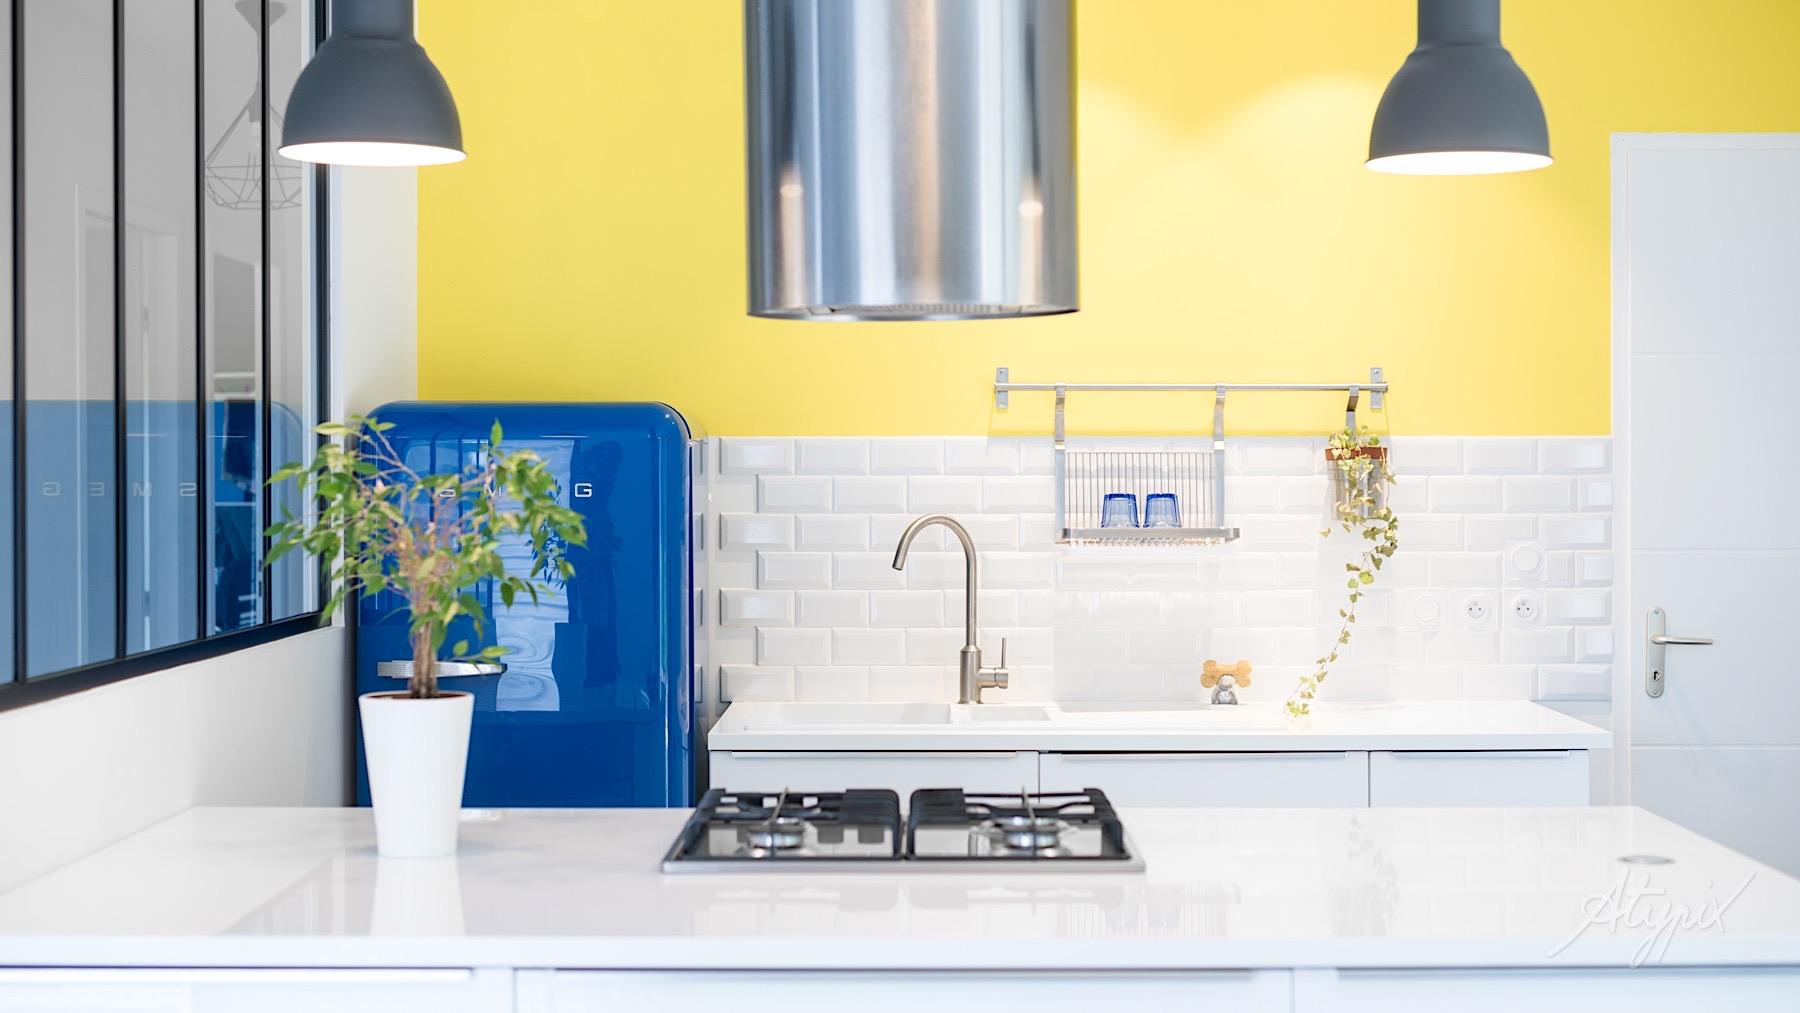 photographe immobilier cuisine